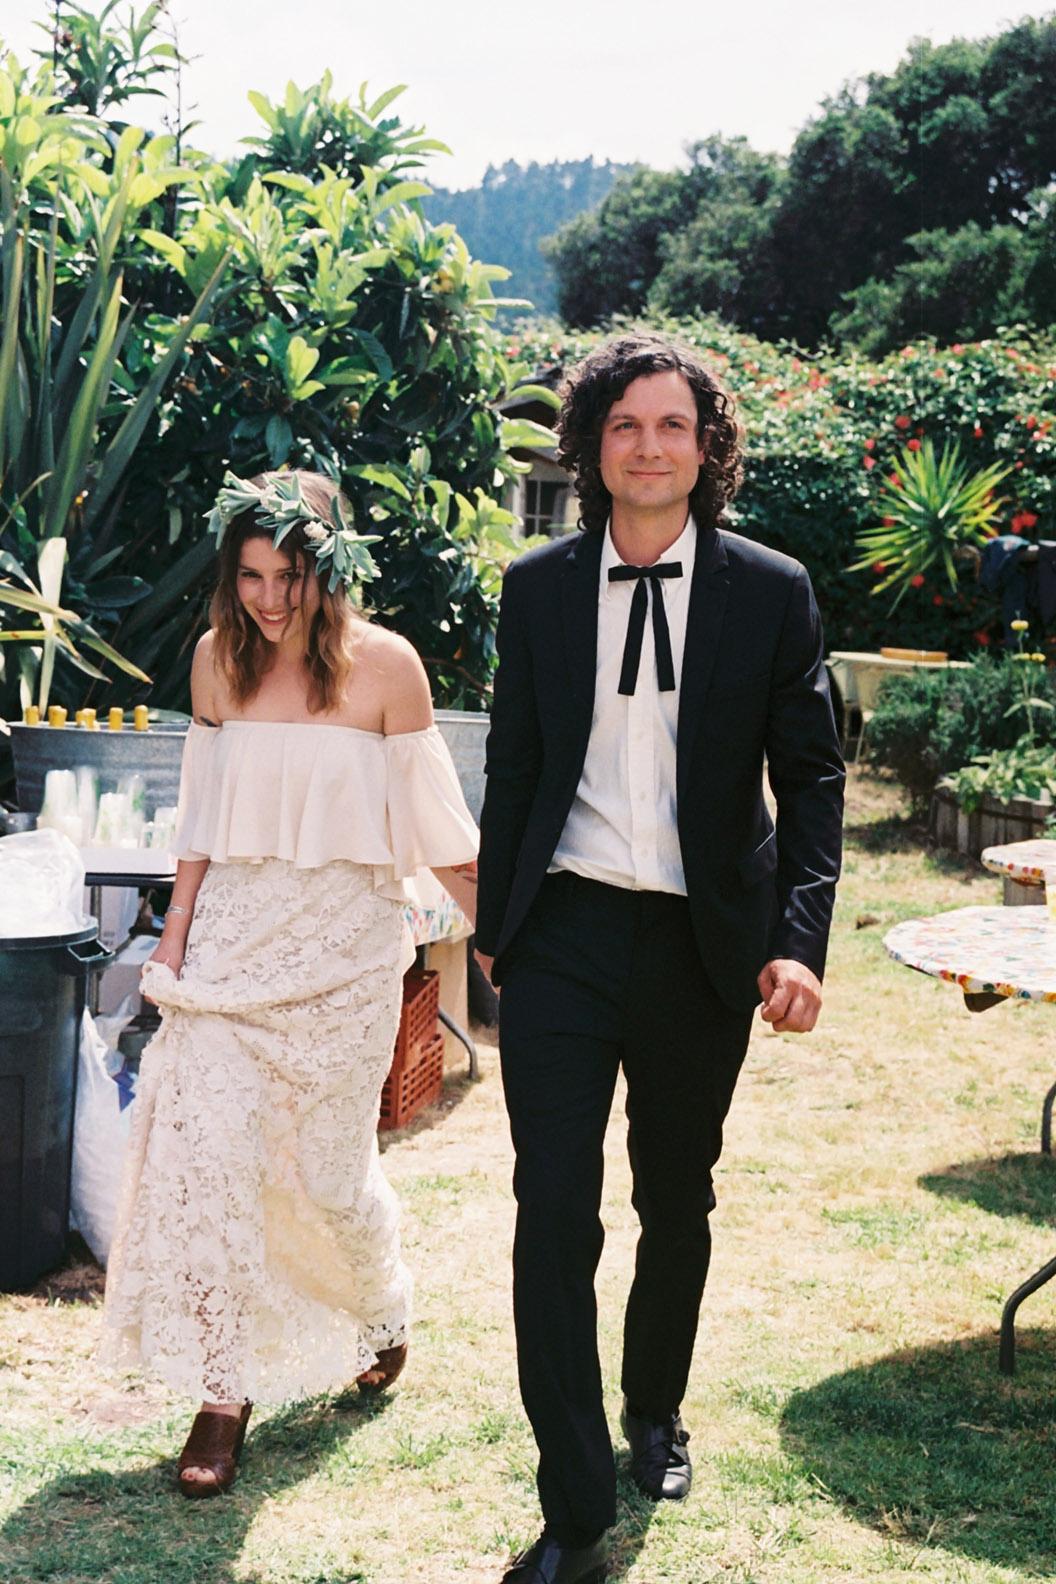 Renee and Miller walk into wedding party.jpg